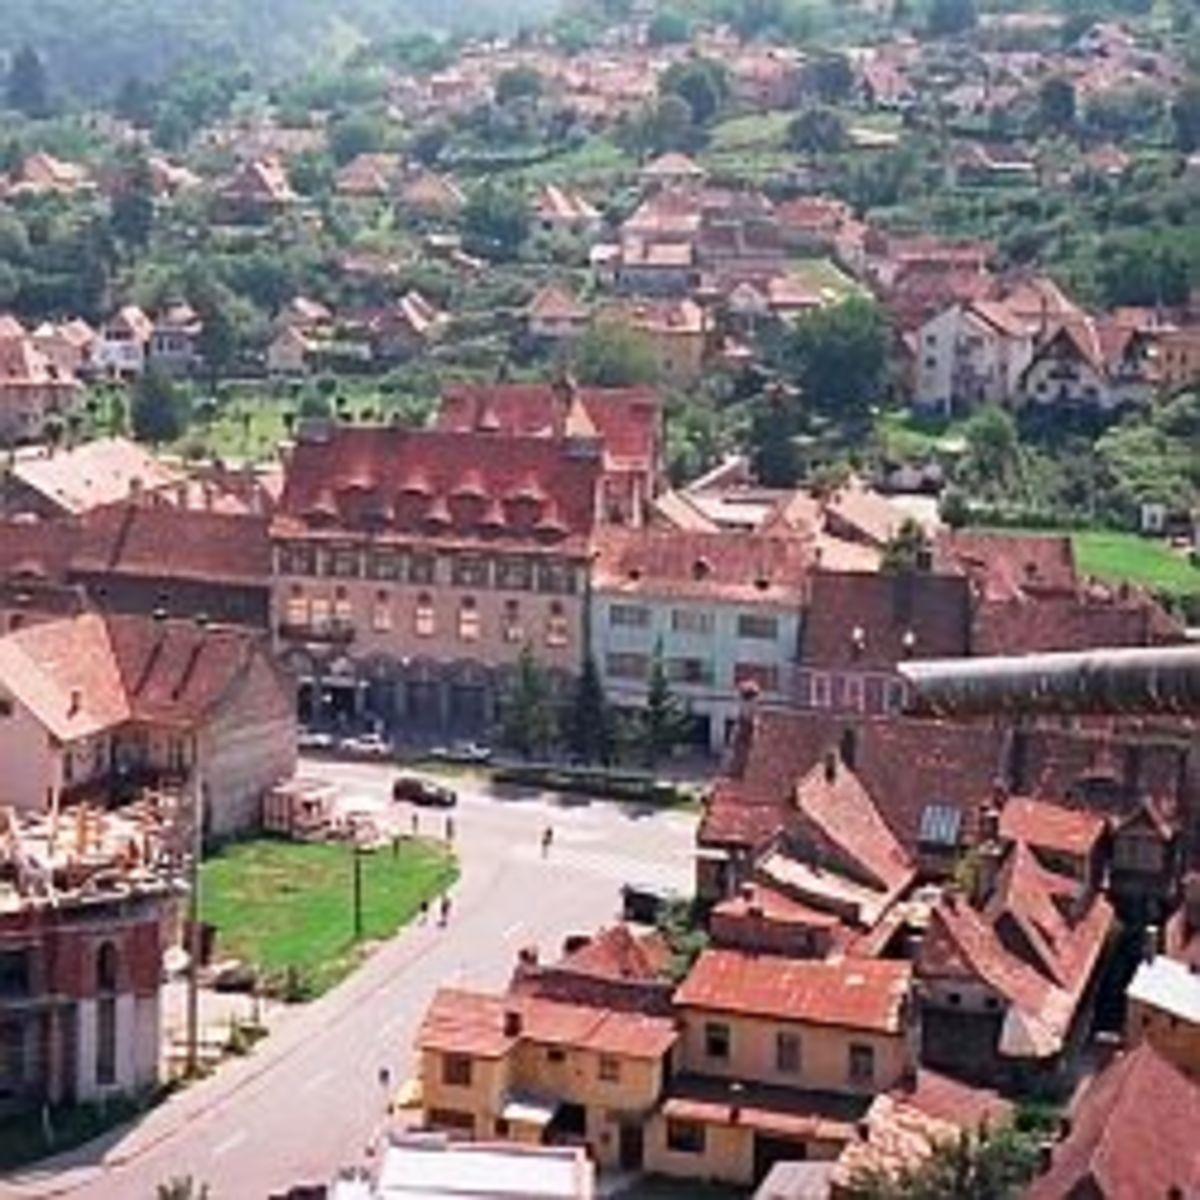 Sighisoara - the City where Vlad Tepes Was Born